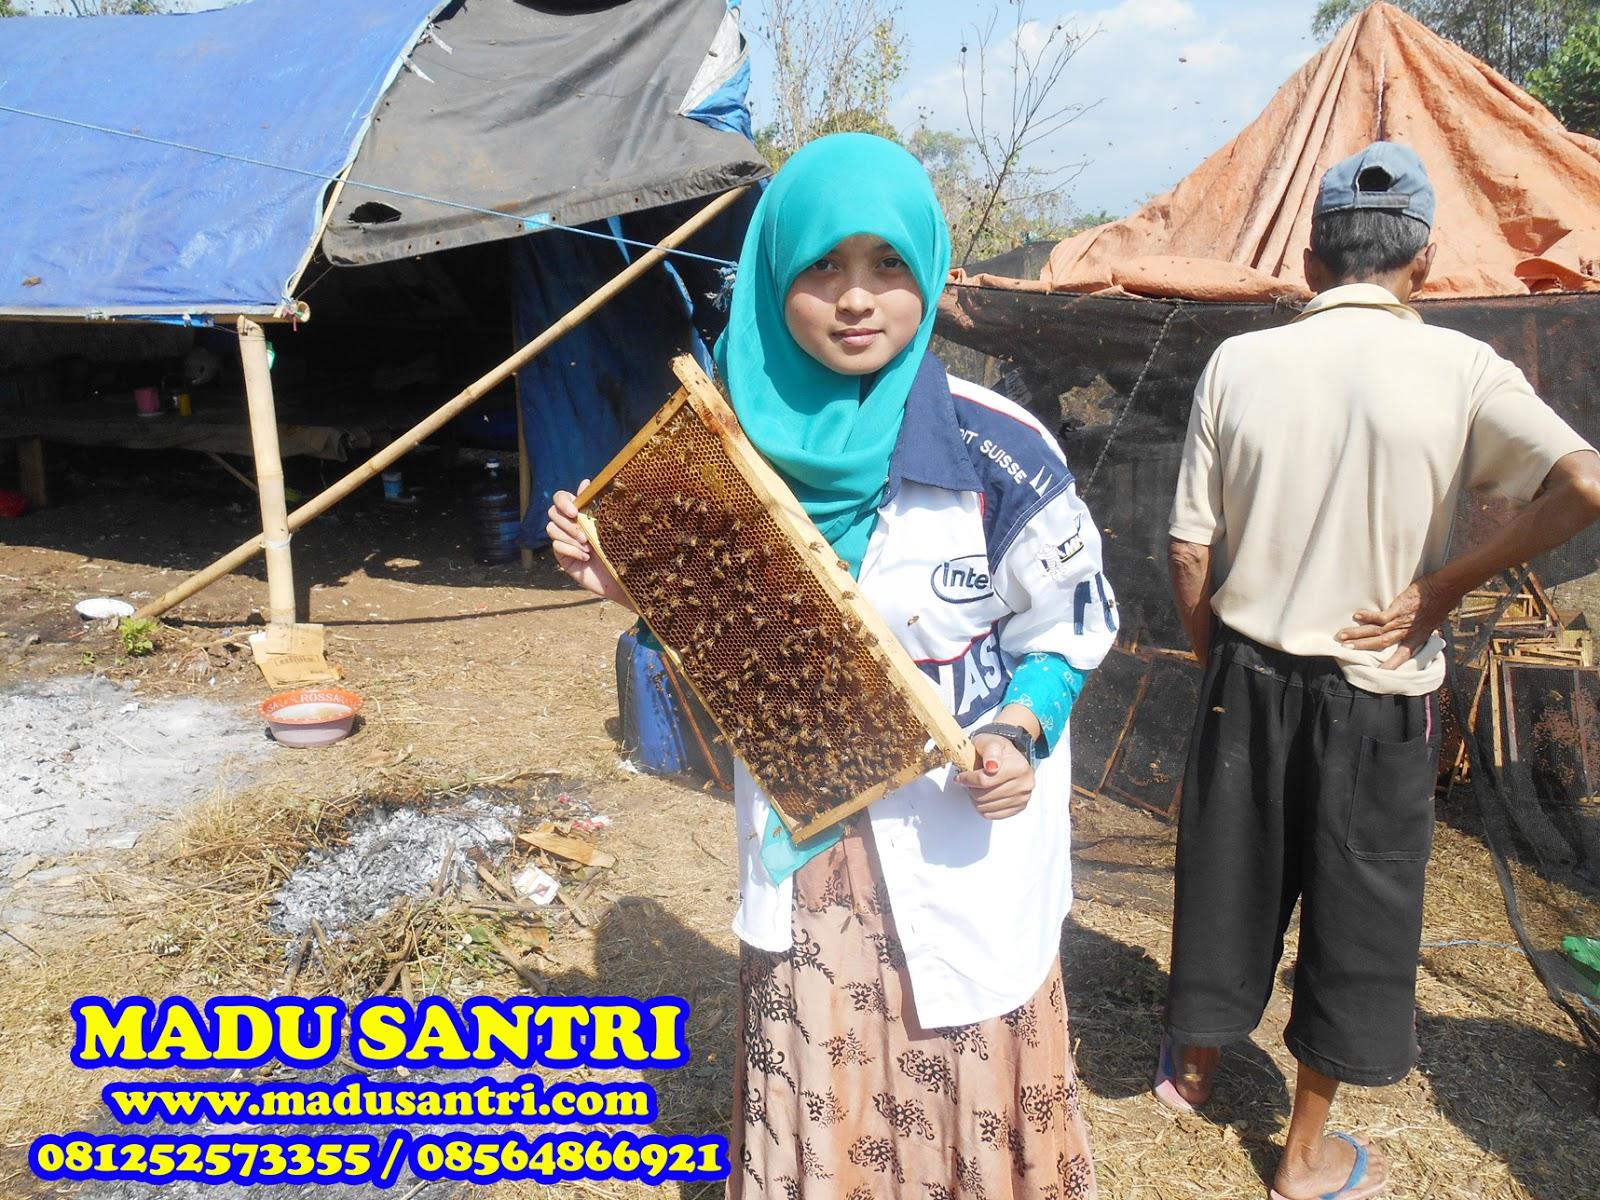 Jual Madu Asli Di Lamongan Gresik Grosir Murni Hutan Berikut Adalah Dokumentasi Panen Lokasi Budidaya Lebah Daerah Gunung Wilis Kediri Jawa Timur